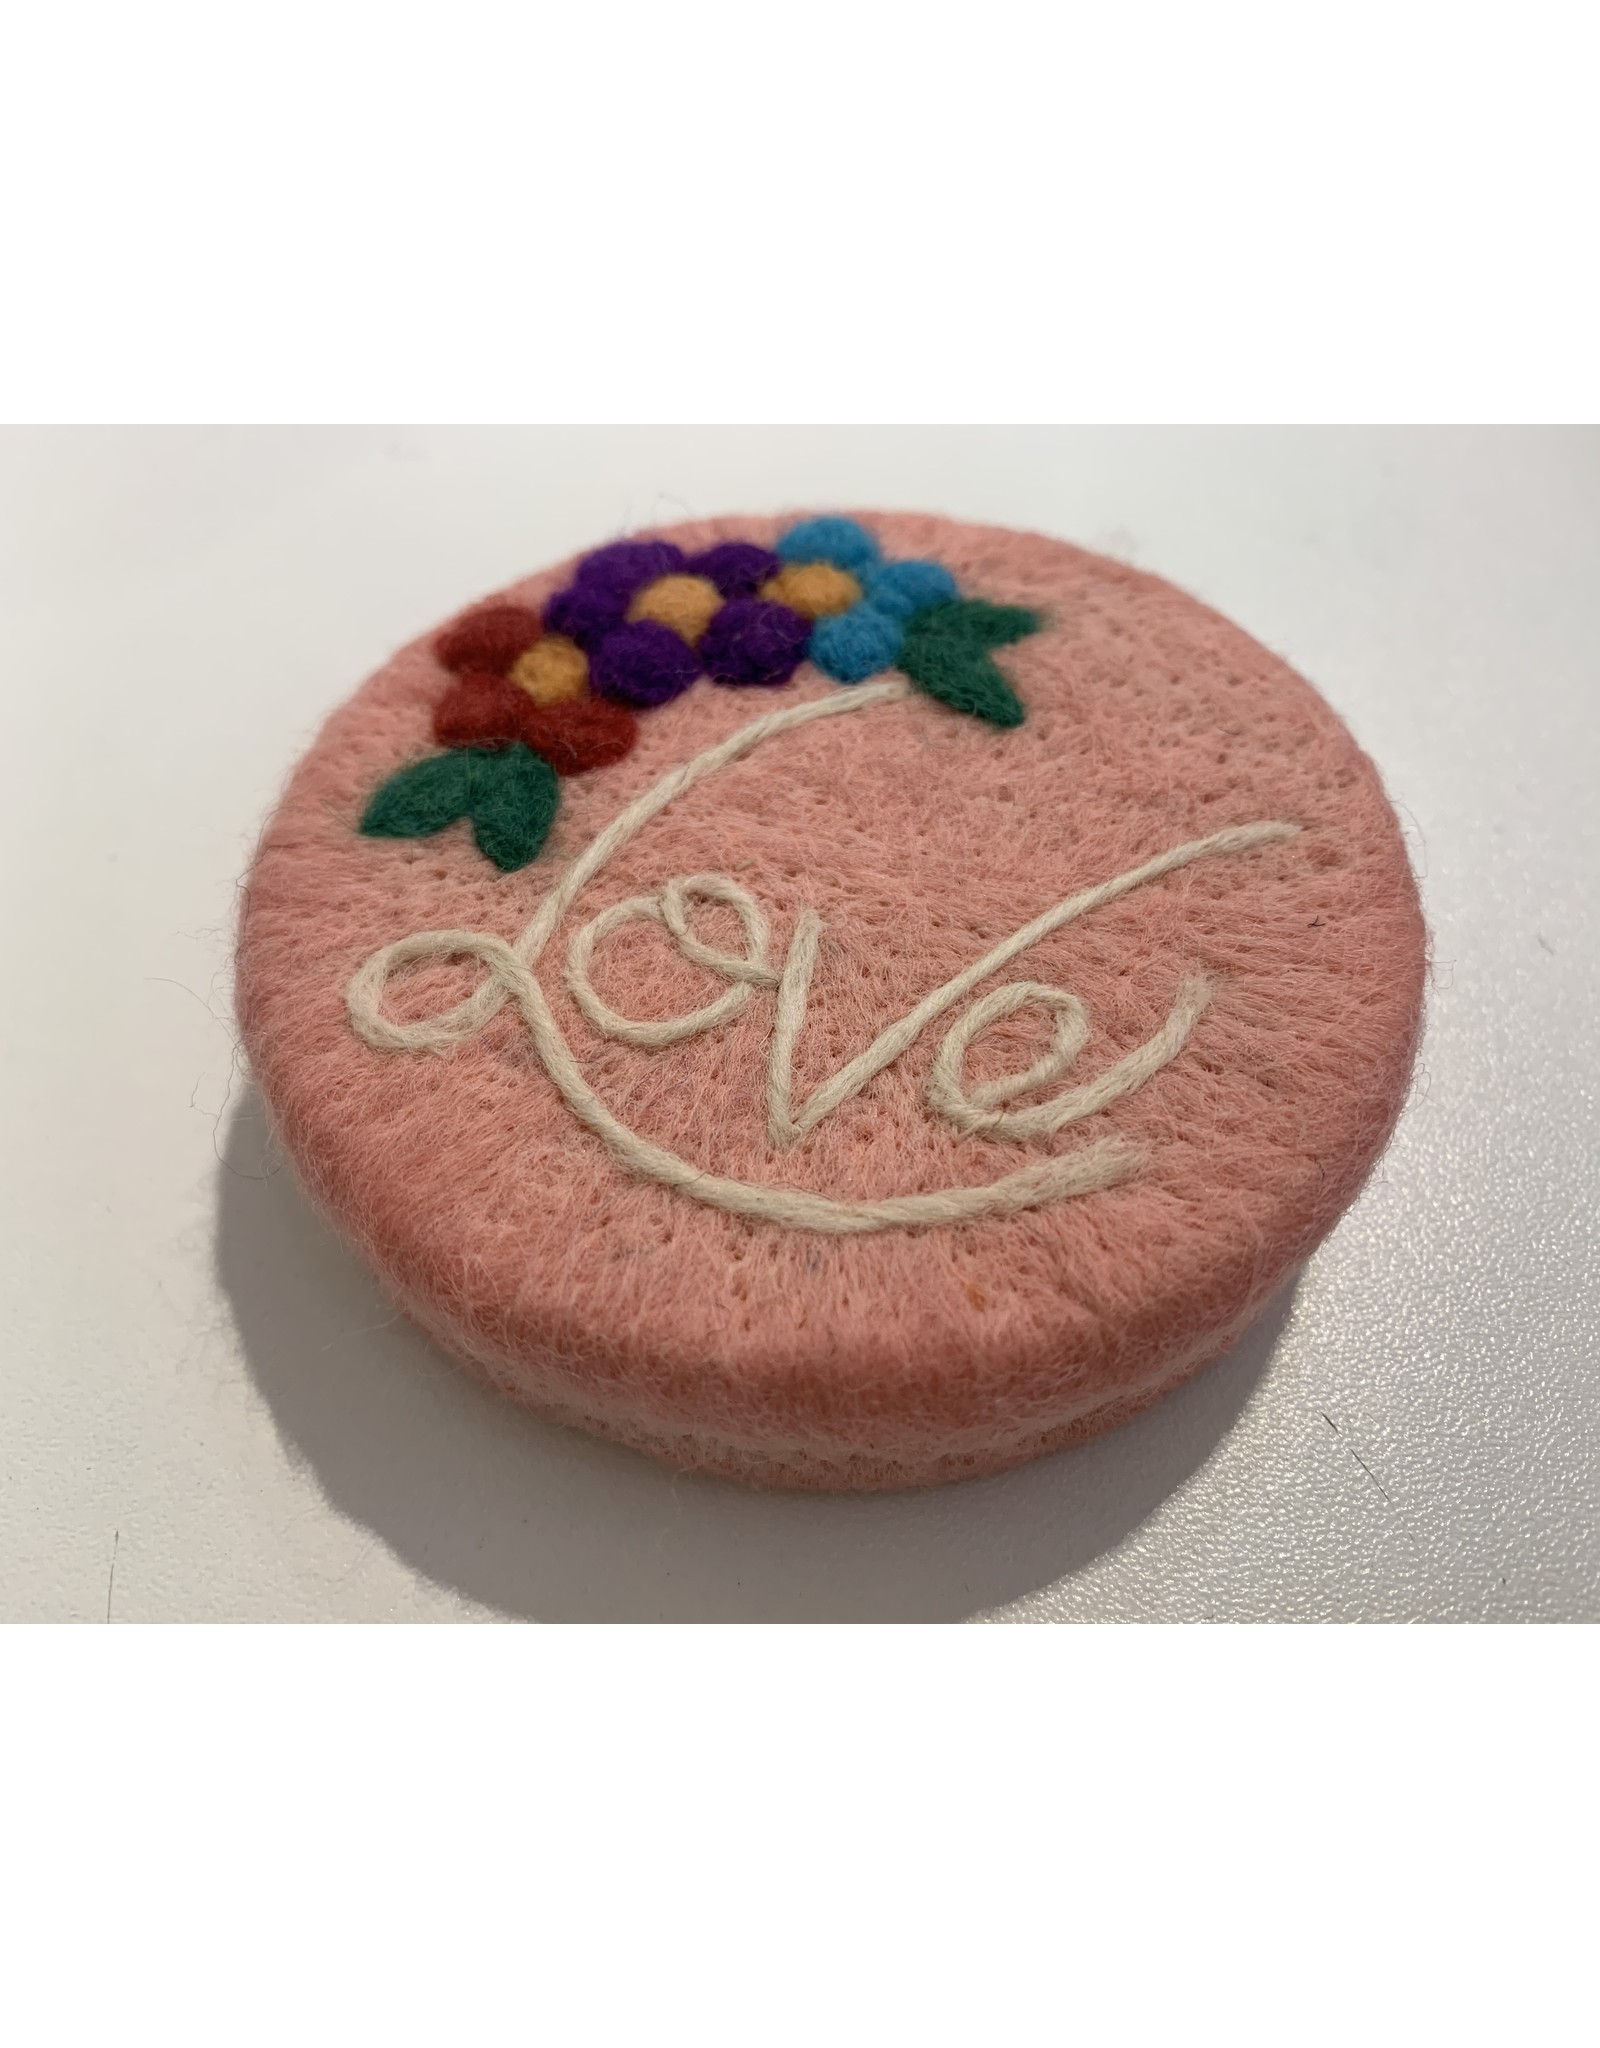 Filzseife Rosa/Love 100% Wollfilz Handmade